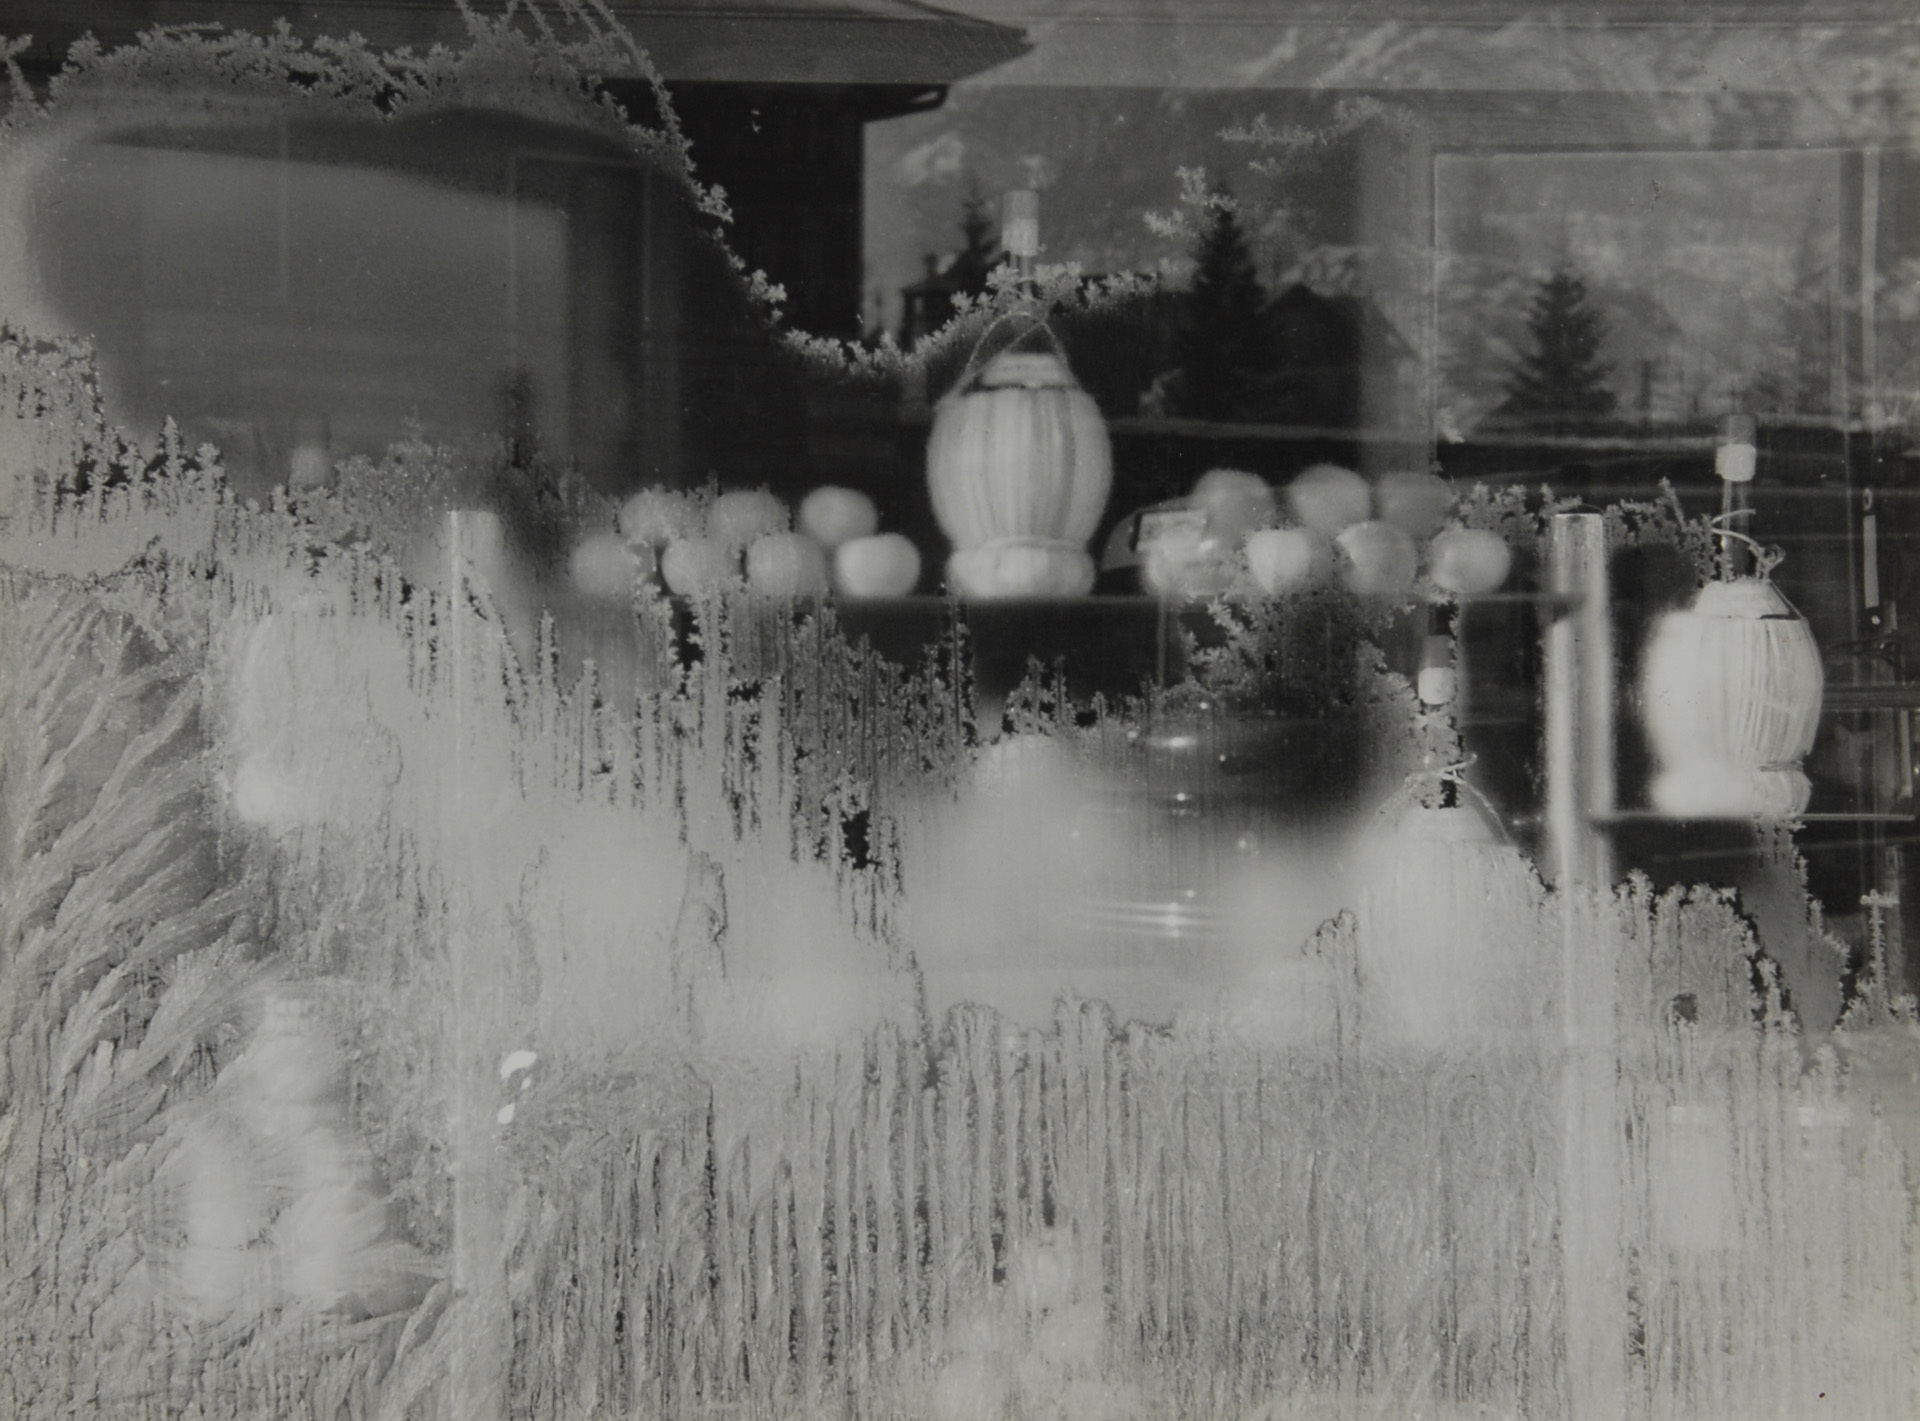 De Luigi Eugenio, 2 photographs: Riflessi in una vetrina a Lucerna, 1952; La vetrina